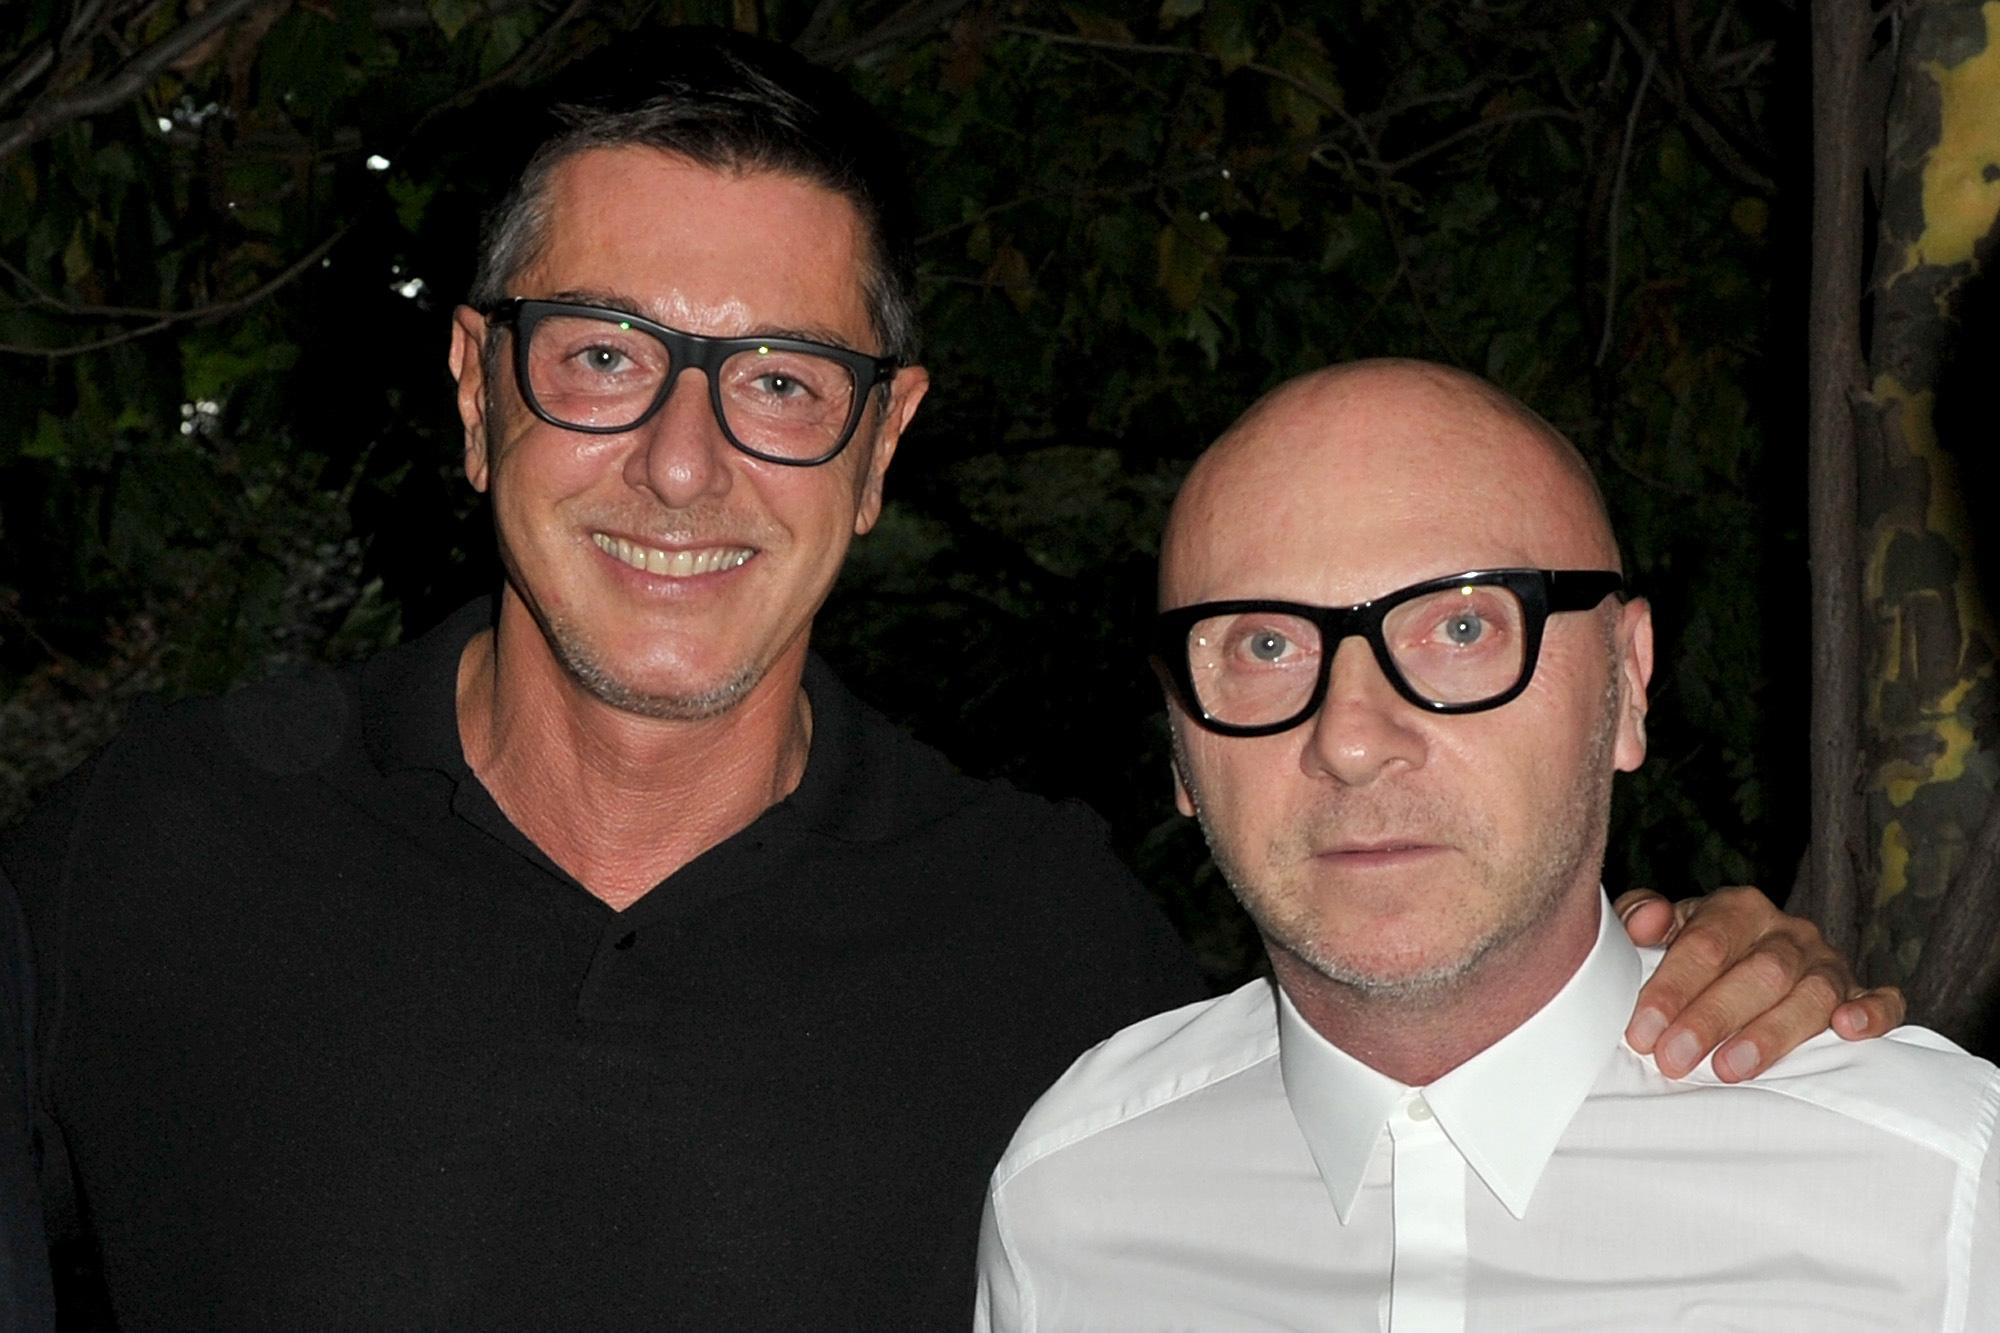 Stefano-Gabbana-Domenico-Dolce-elton-John-polemica